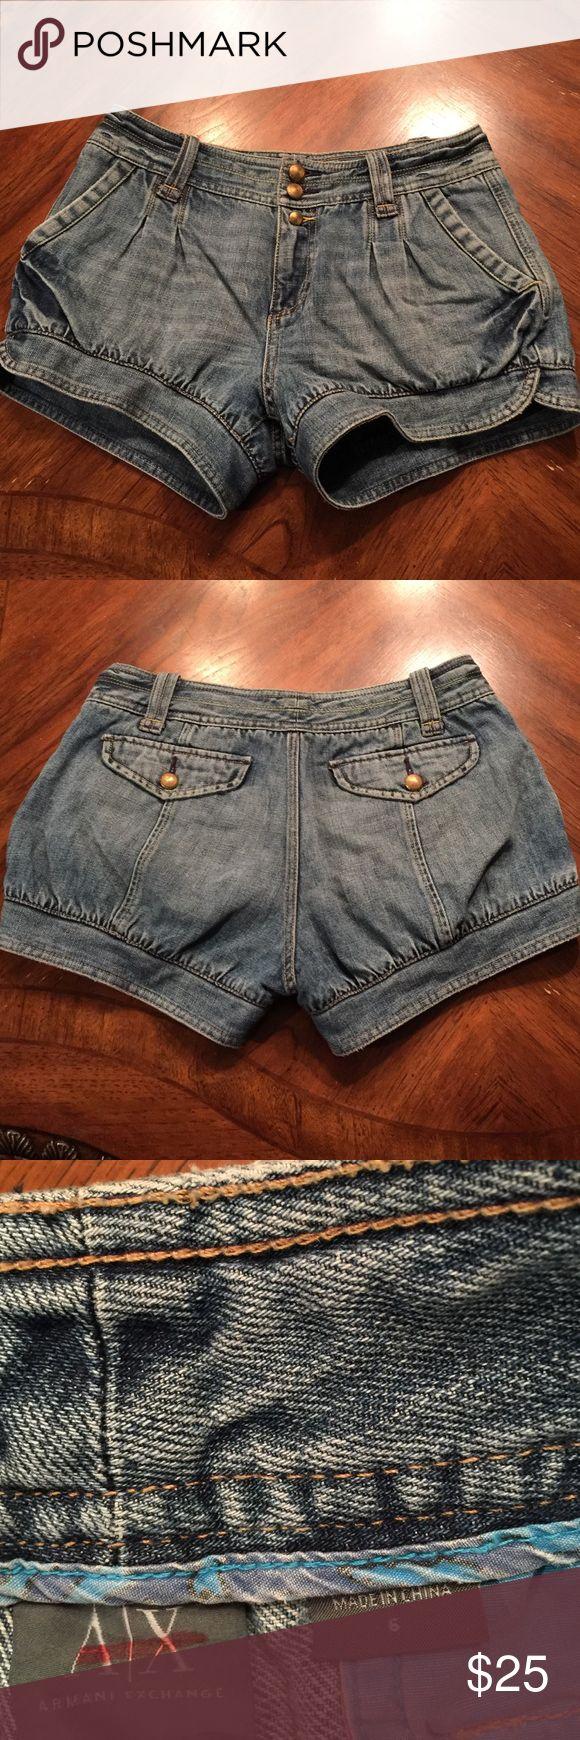 "Armani Exchange sz6 bloomer style jean shorts Good used condition Armani Exchange sz6 bloomer style jean shorts...3"" inseam.. A/X Armani Exchange Shorts"